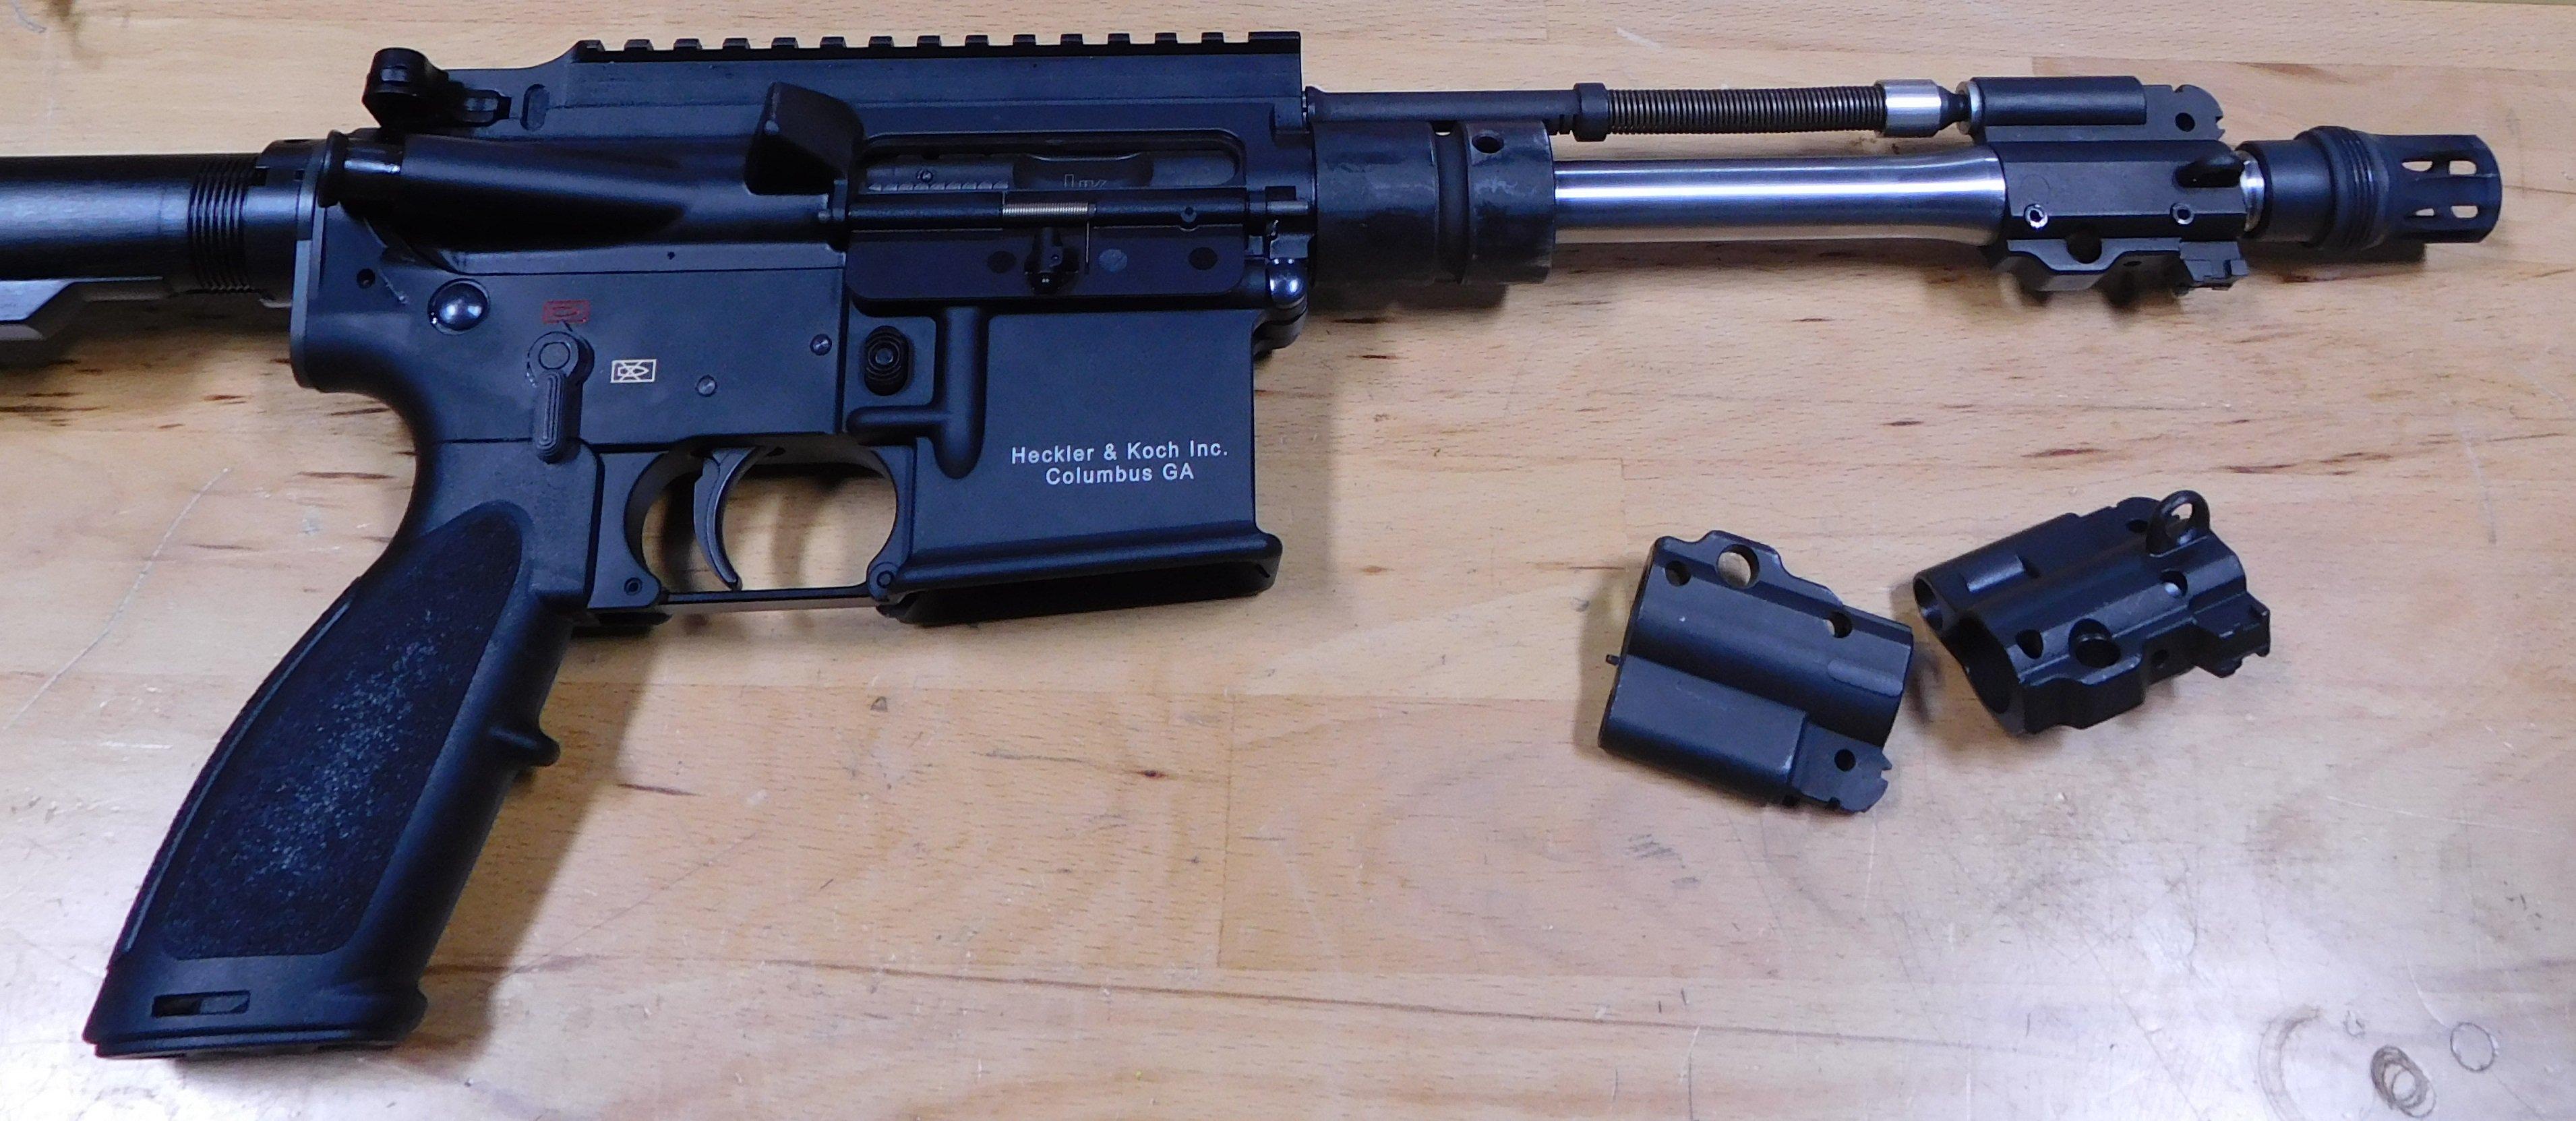 HK416C Gas Problem-9.0-pdw-2.jpg